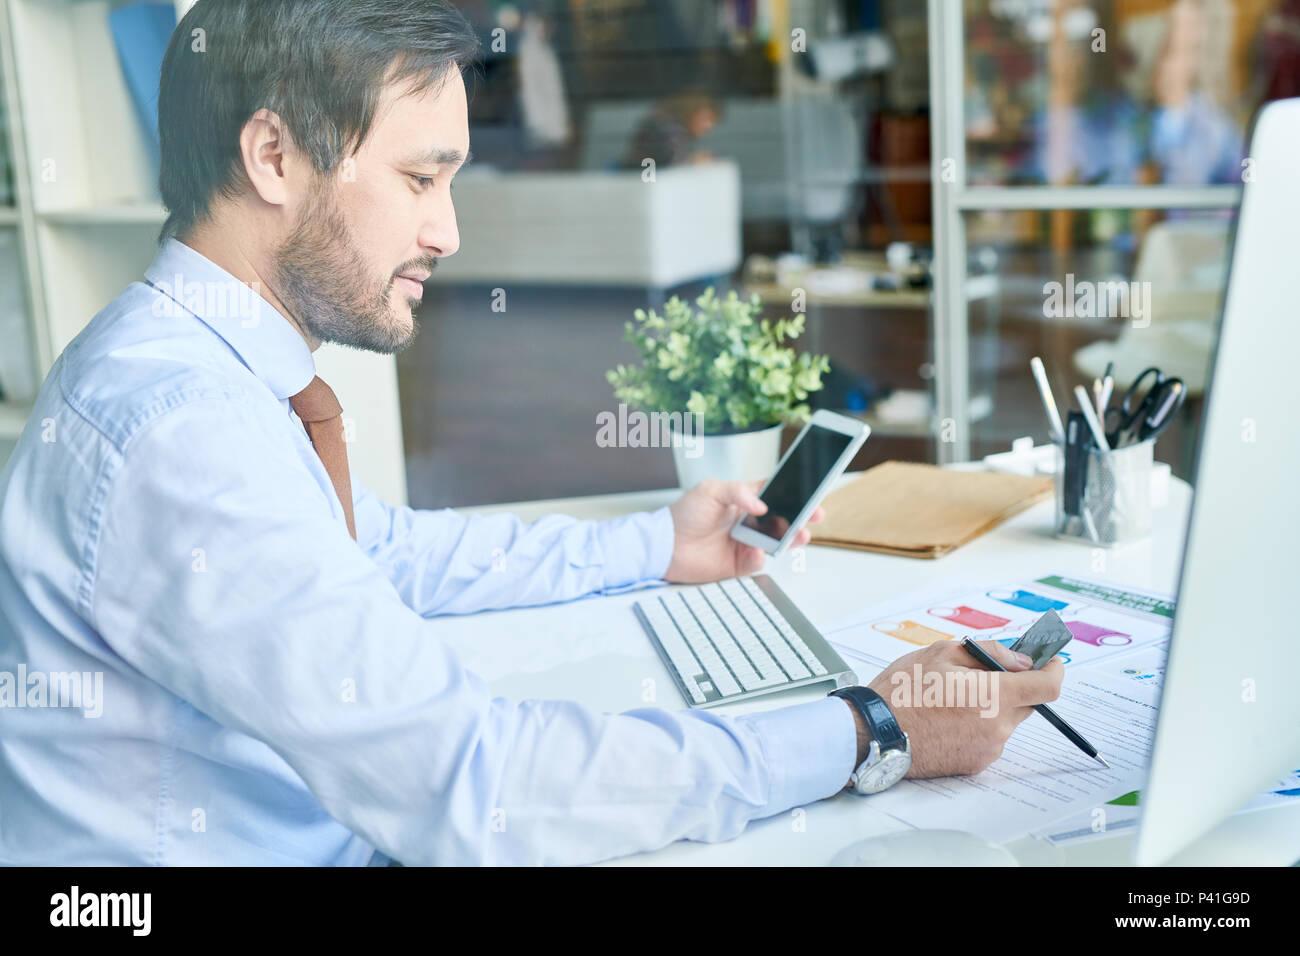 Man using phone and credit card - Stock Image